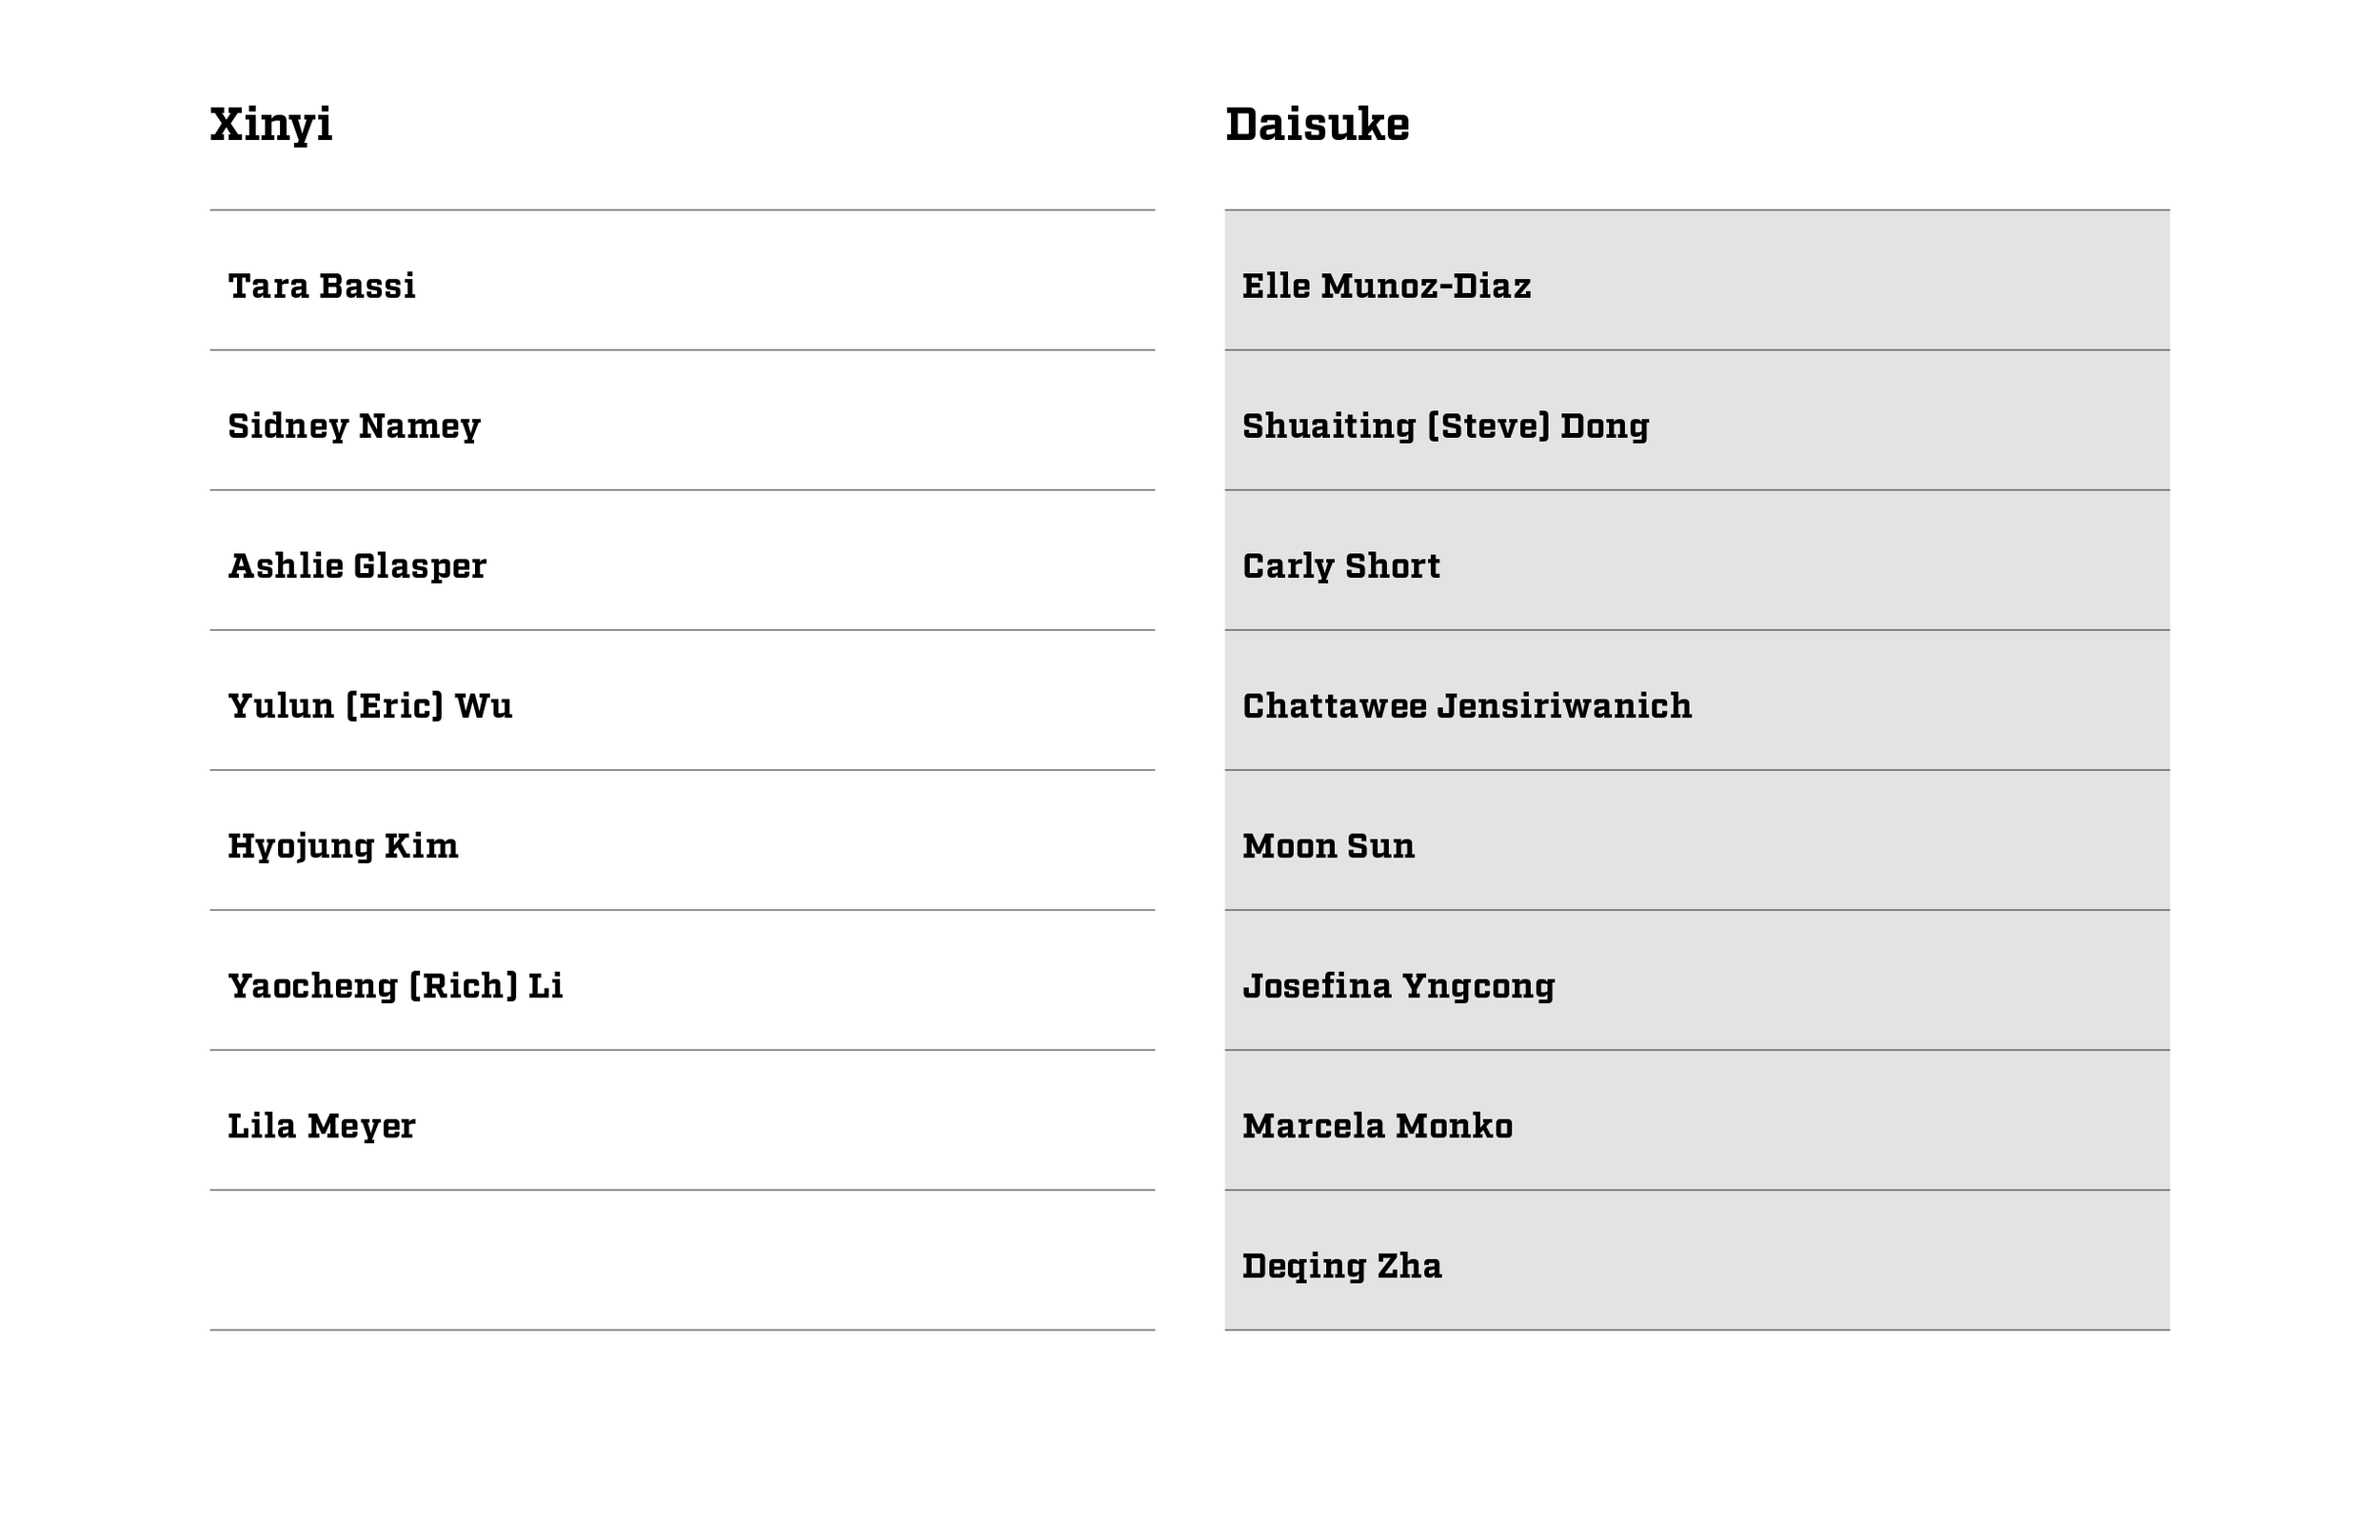 ComD_371-11_IVC_FA18_Daisuke_Week_6-14.png